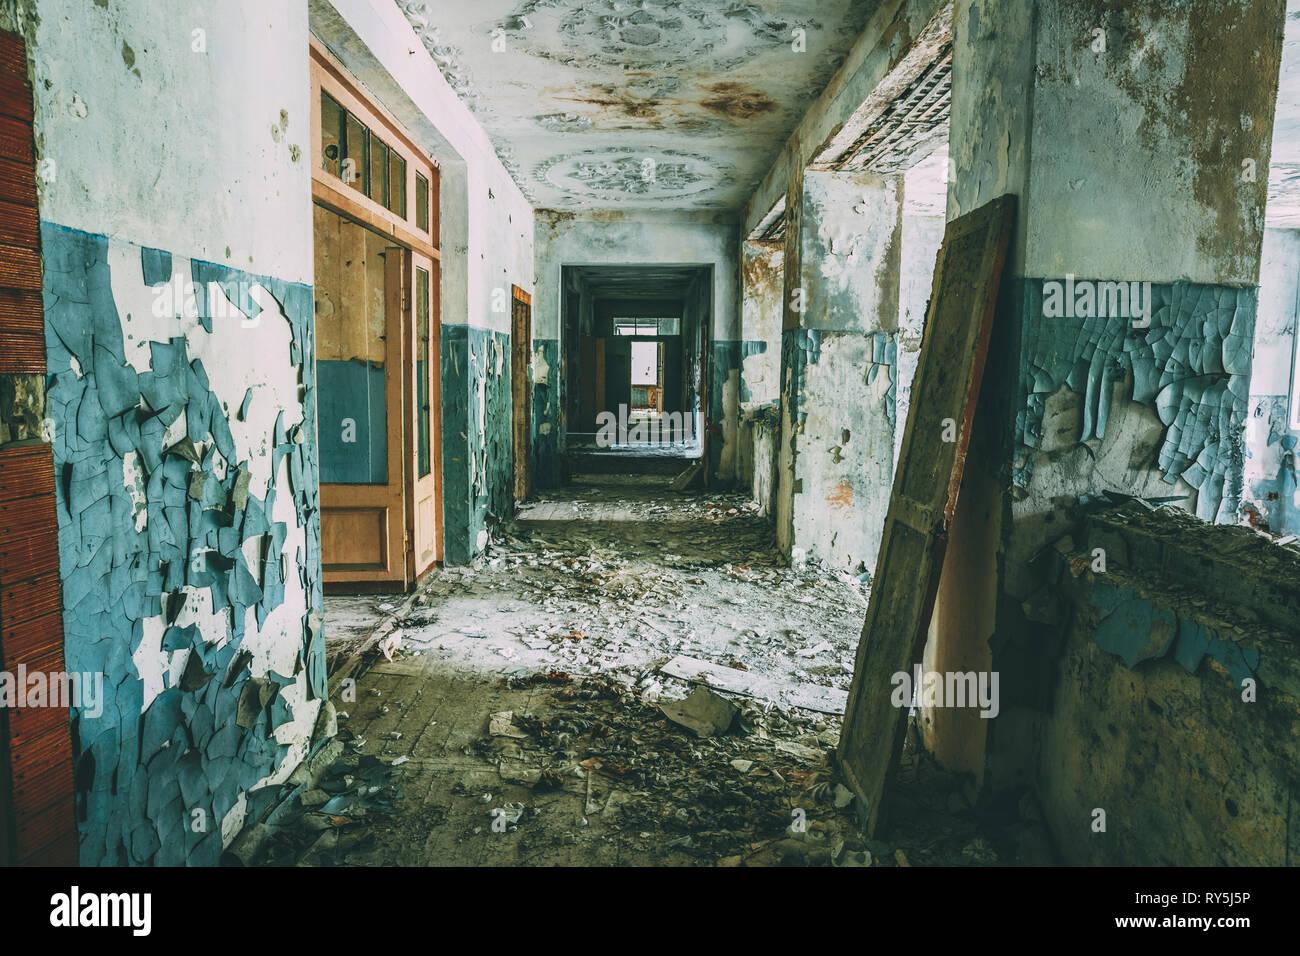 Dilapidated passage in school of Pripyat. Chernobyl Disaster - Stock Image